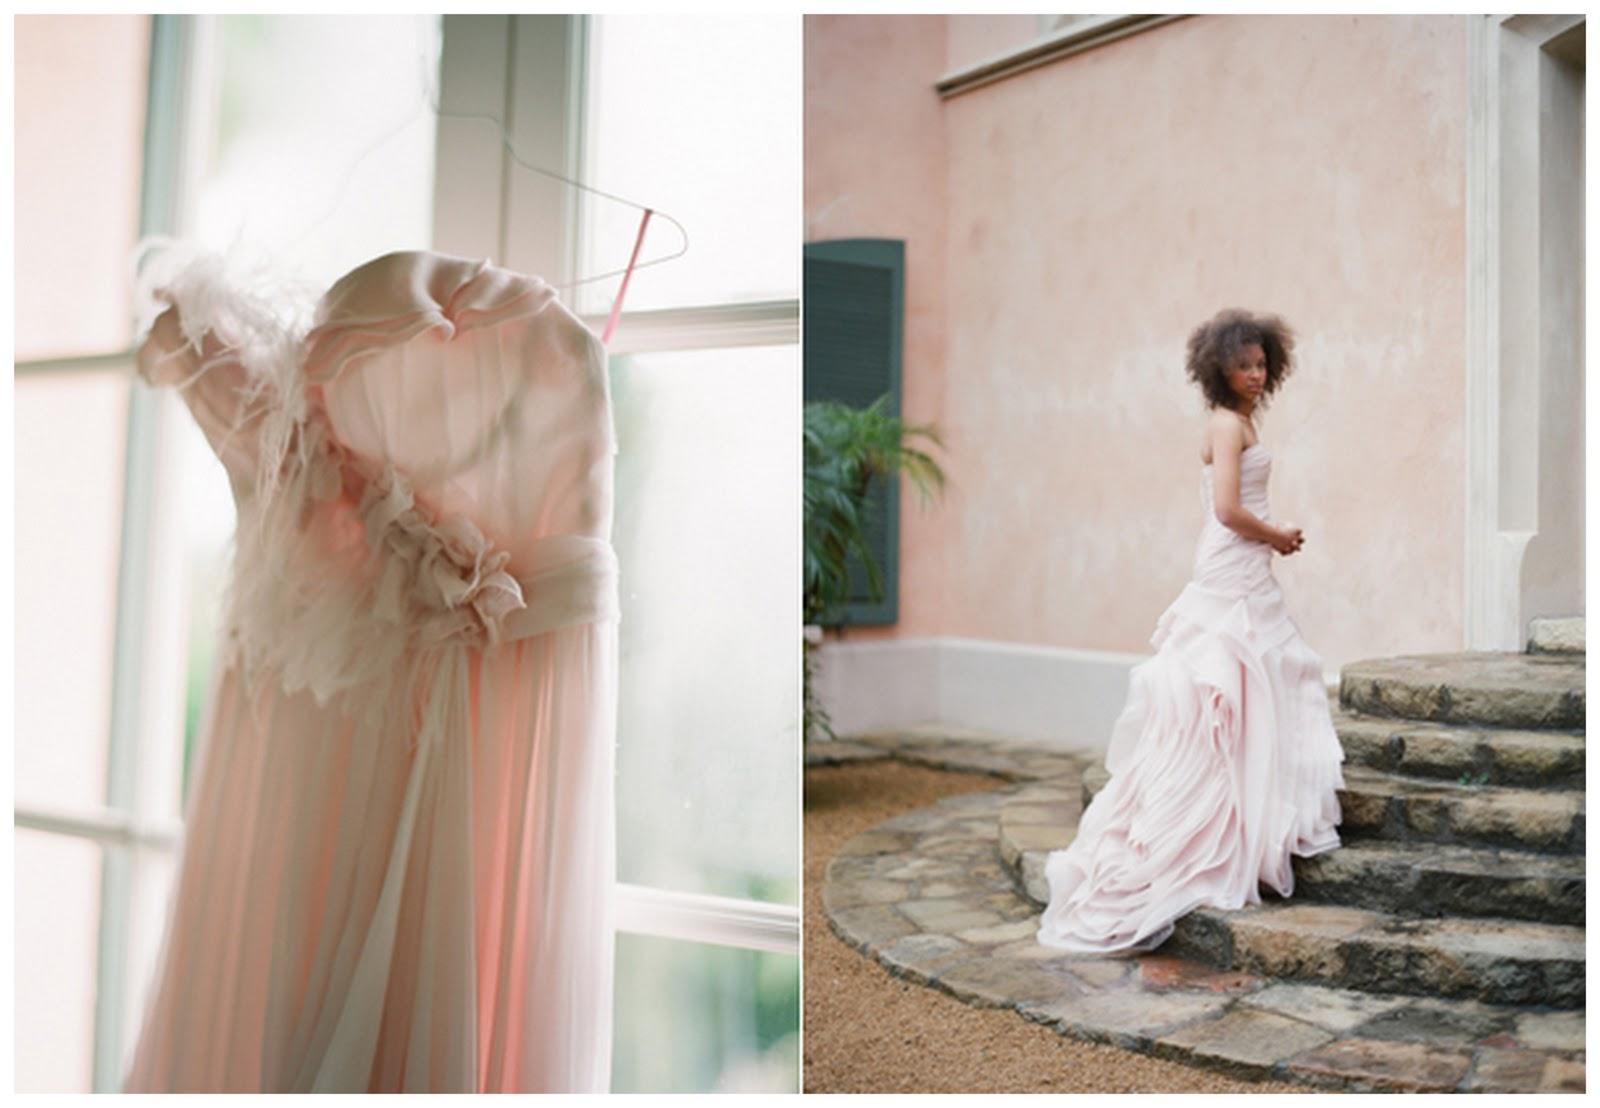 http://4.bp.blogspot.com/--wsDxi8q8gc/TrhcLcXTLjI/AAAAAAABMaA/cFzrmd-_P0E/s1600/Tinted-Wedding-Dresse-Elizabeth-Messina-Once-Wed-Before-the-Big-Day-Wedding-Blog-UK.jpg